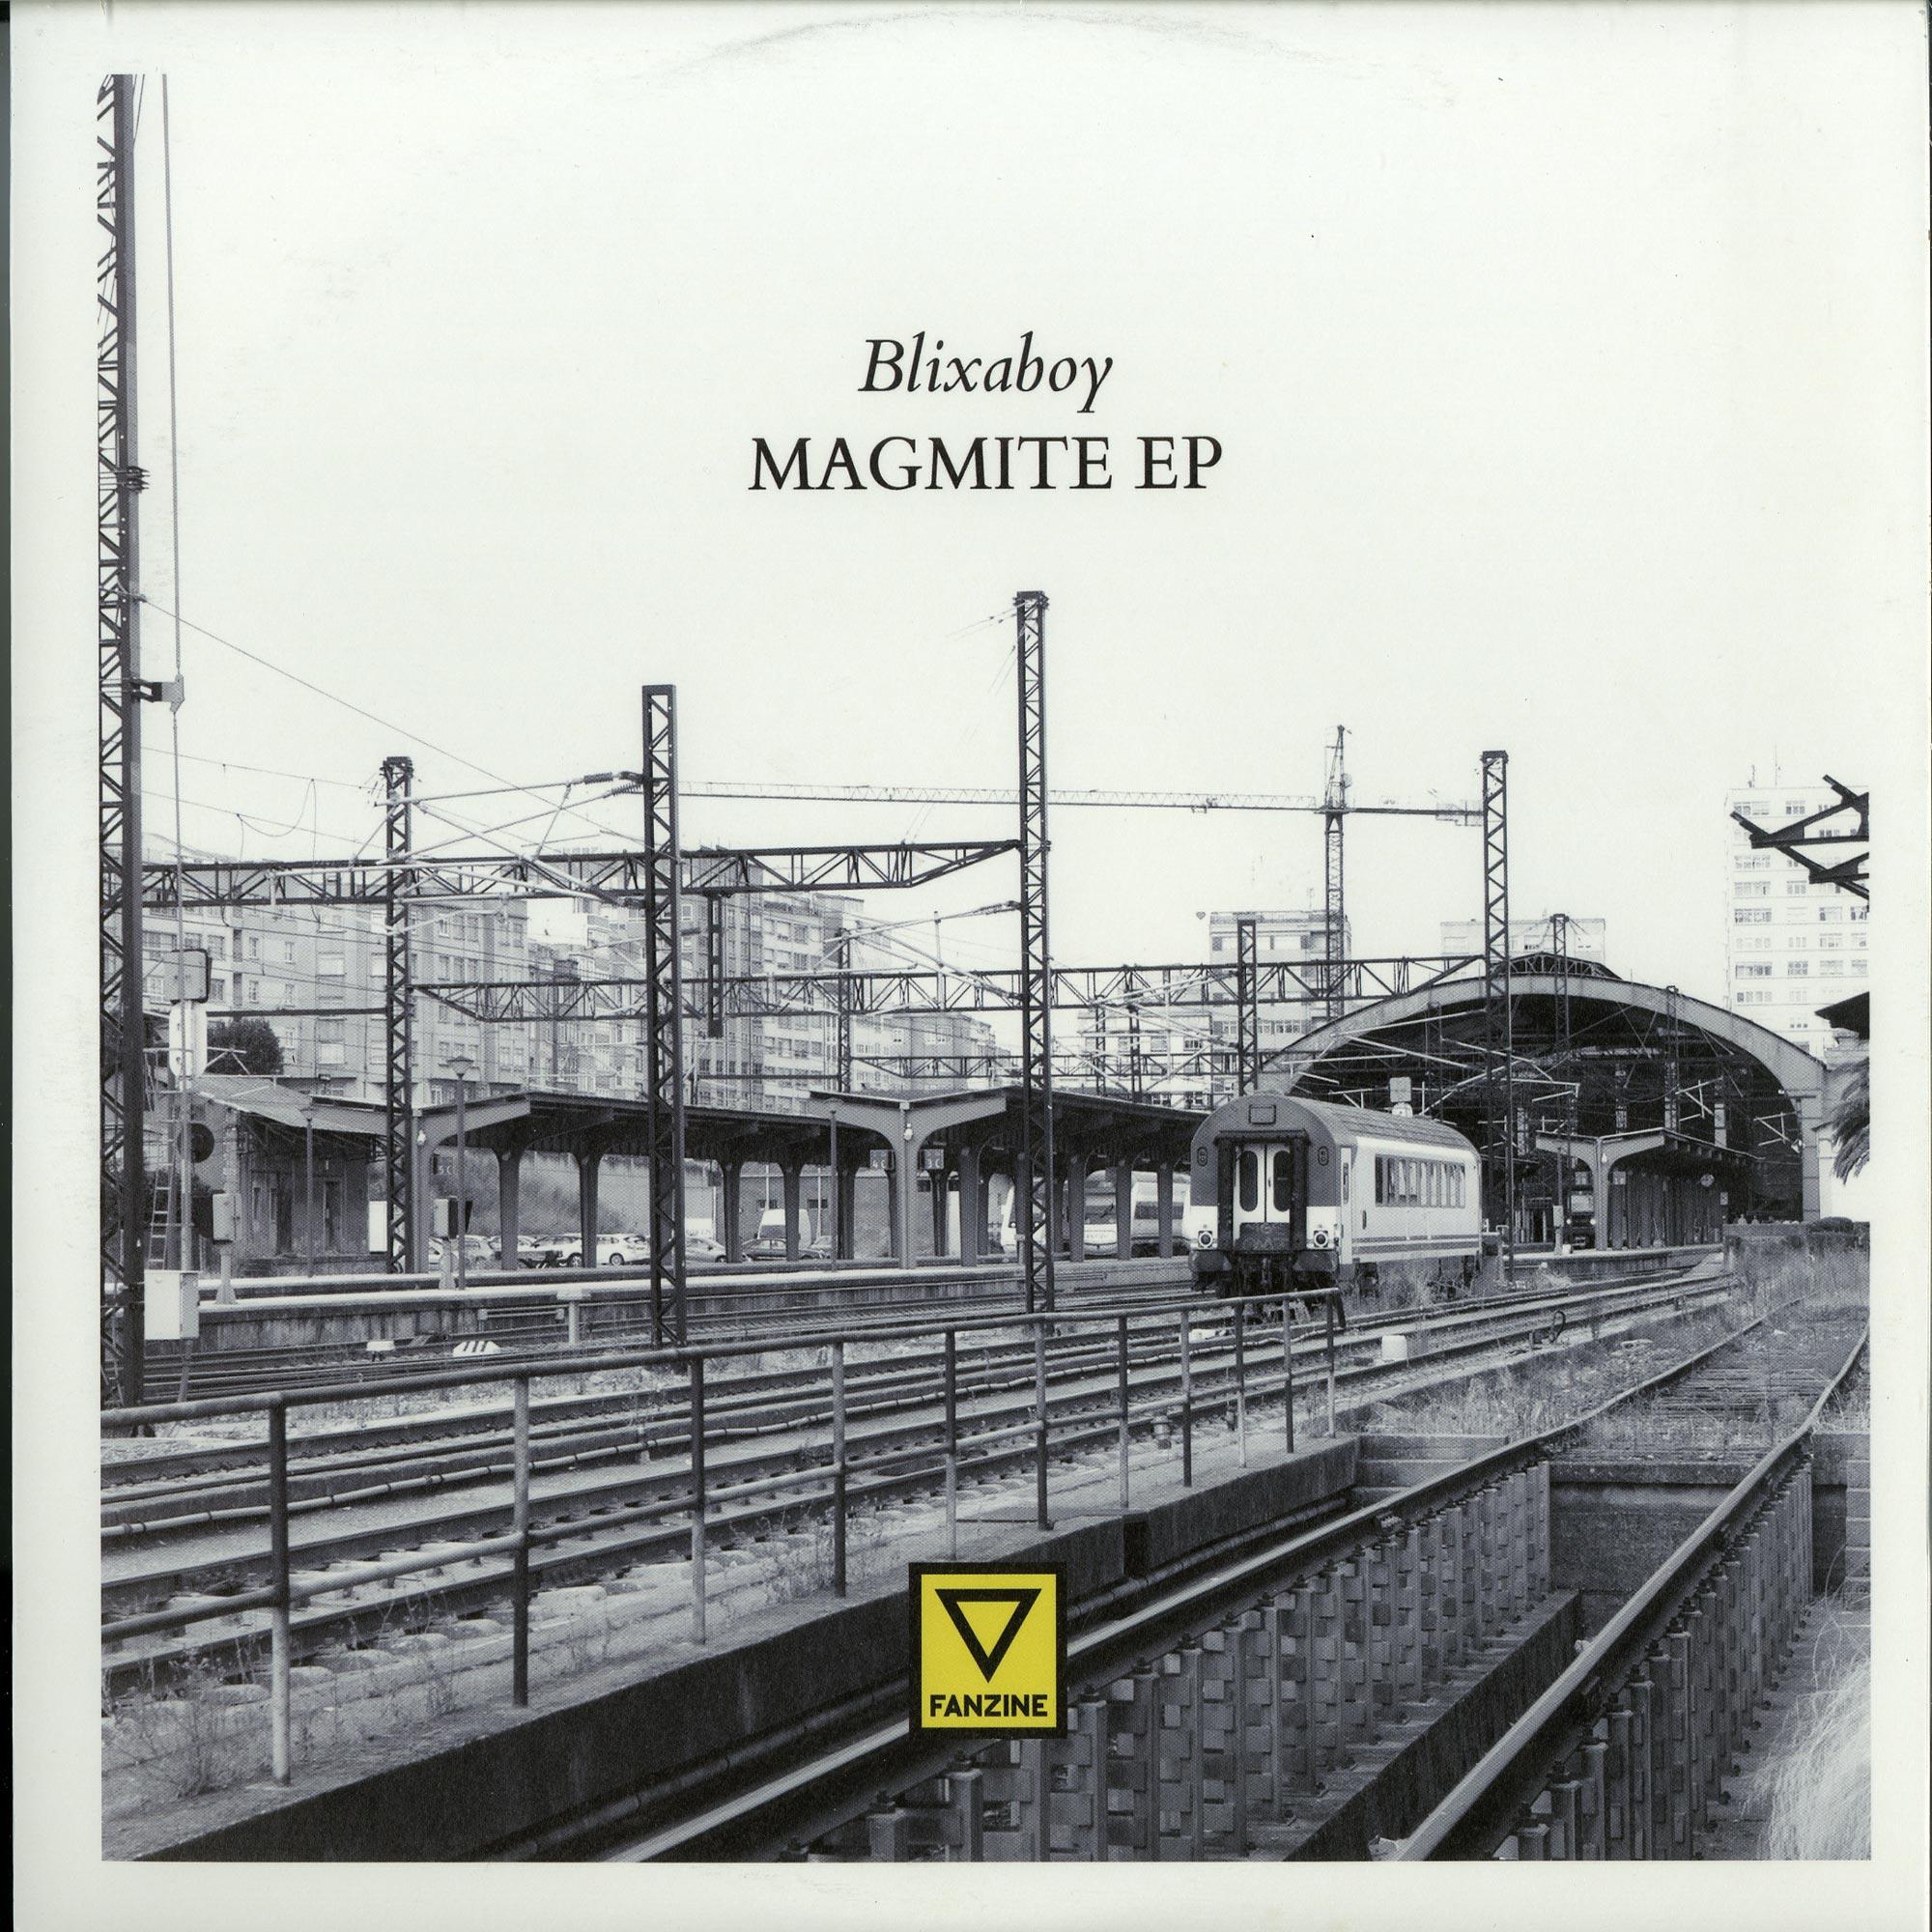 Blixaboy - MAGMITE EP